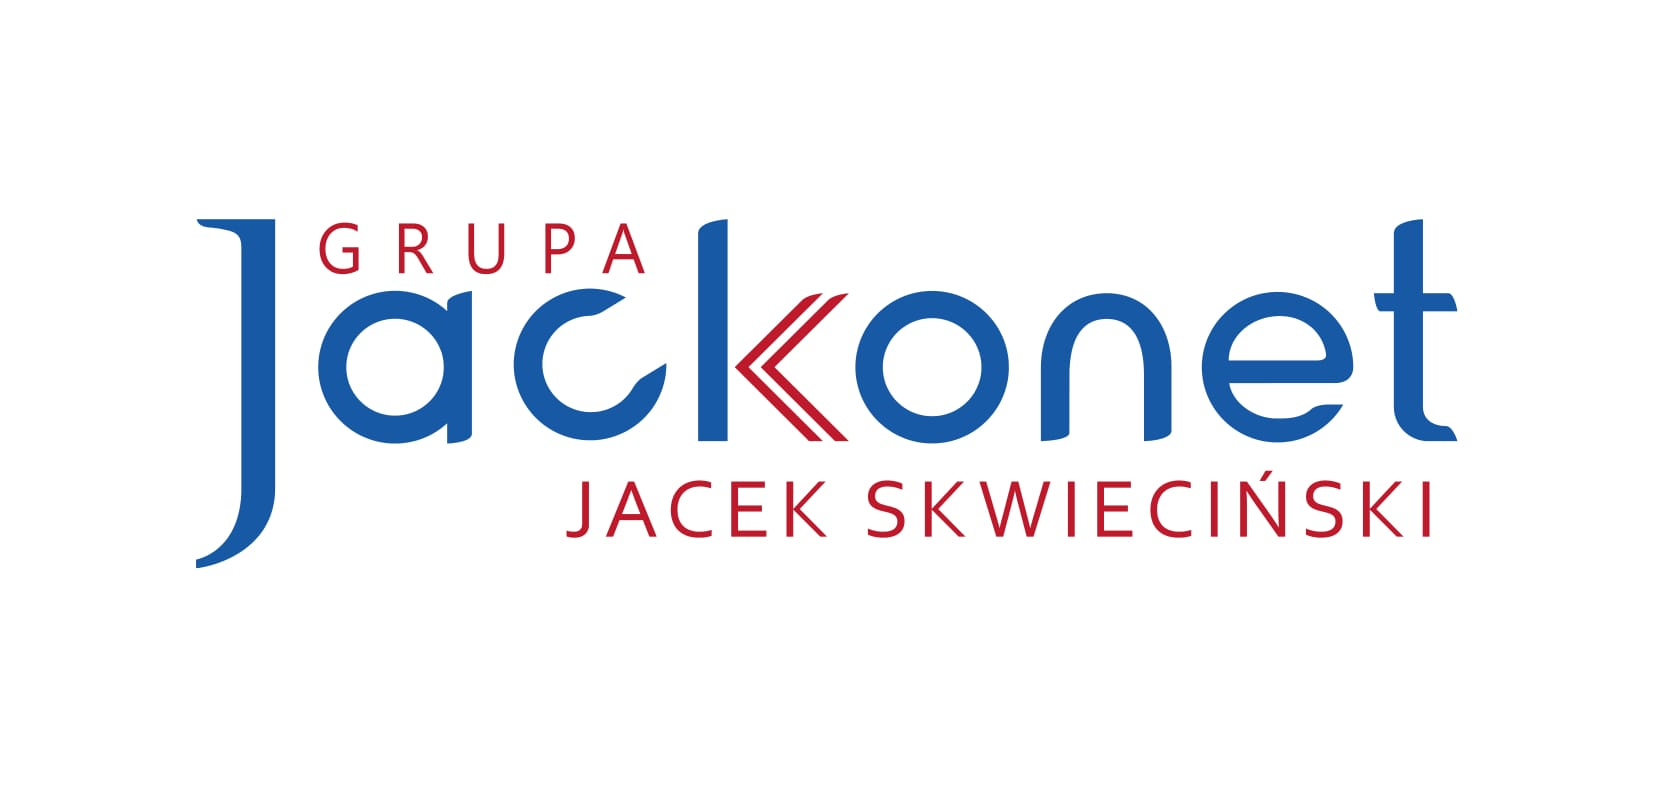 Grupa Jackonet Adres Telefon Www Usługi Garwolin